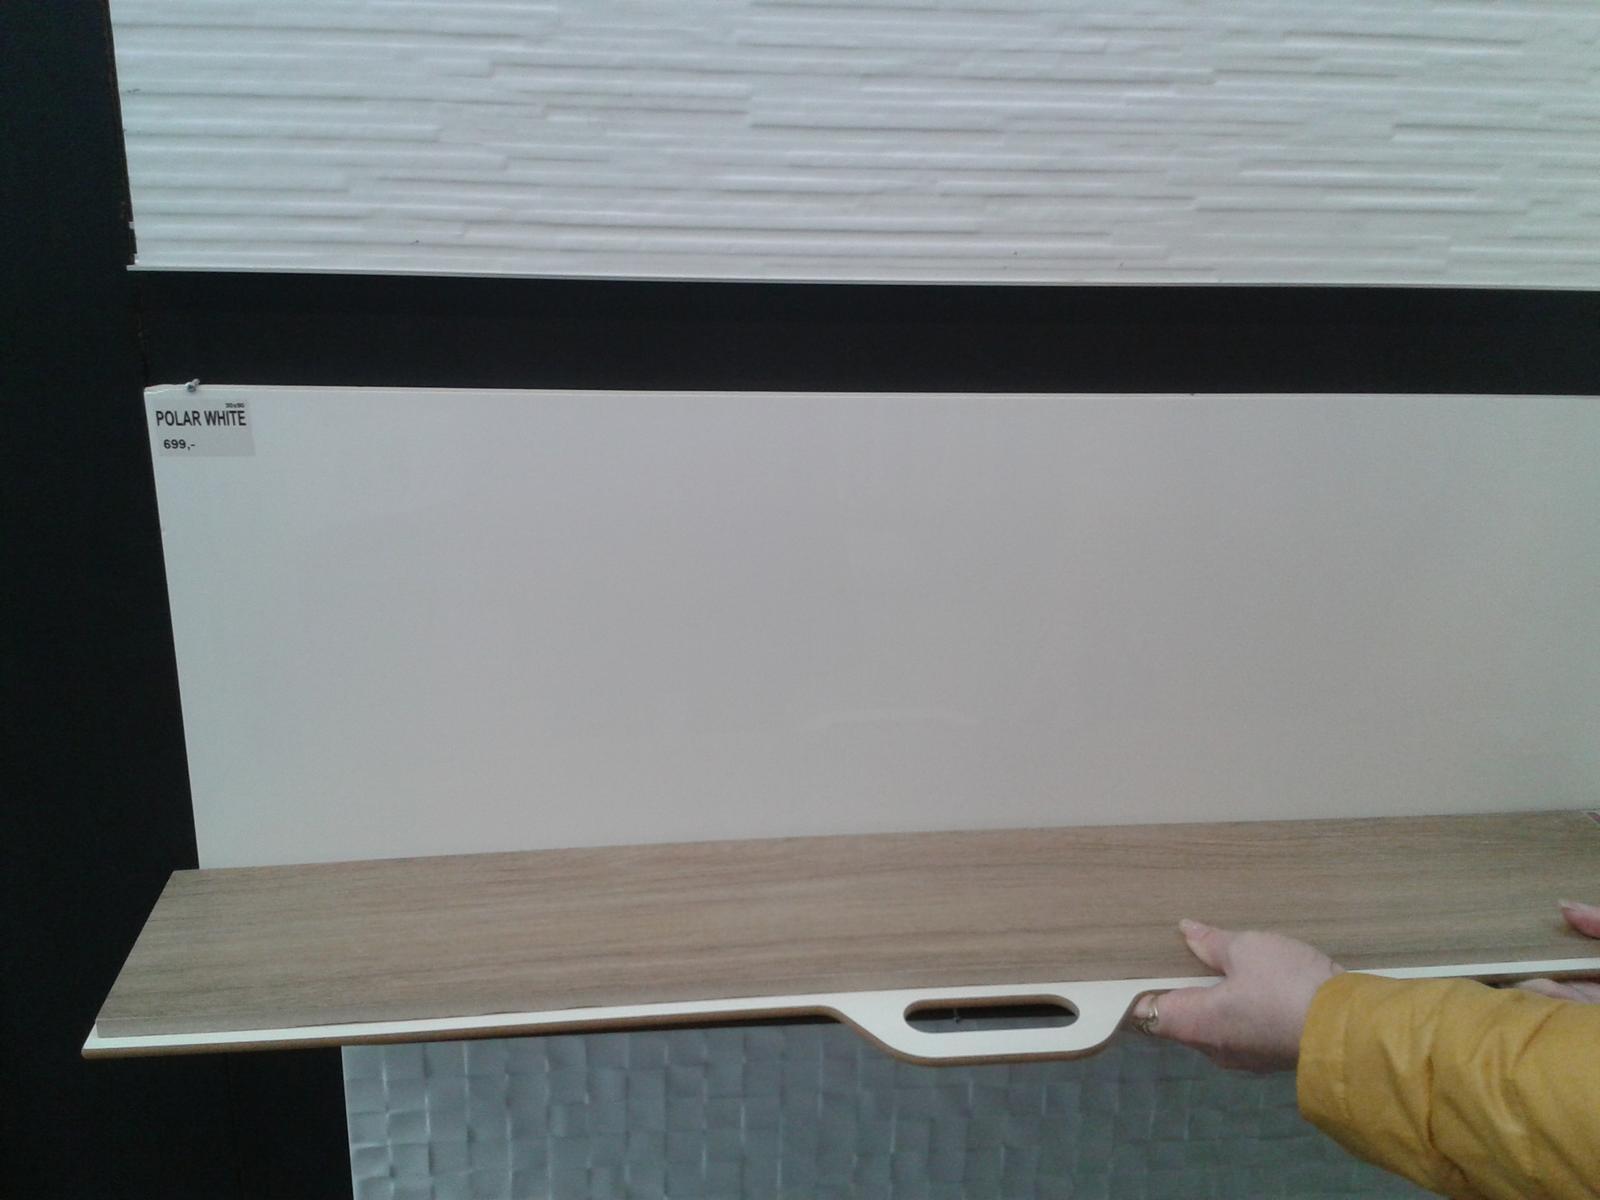 Mala panelakova koupelna - Vybrana dlazba - dekor dreva + bily lesk obklady.. bily lesk asi nahradime smetanovou